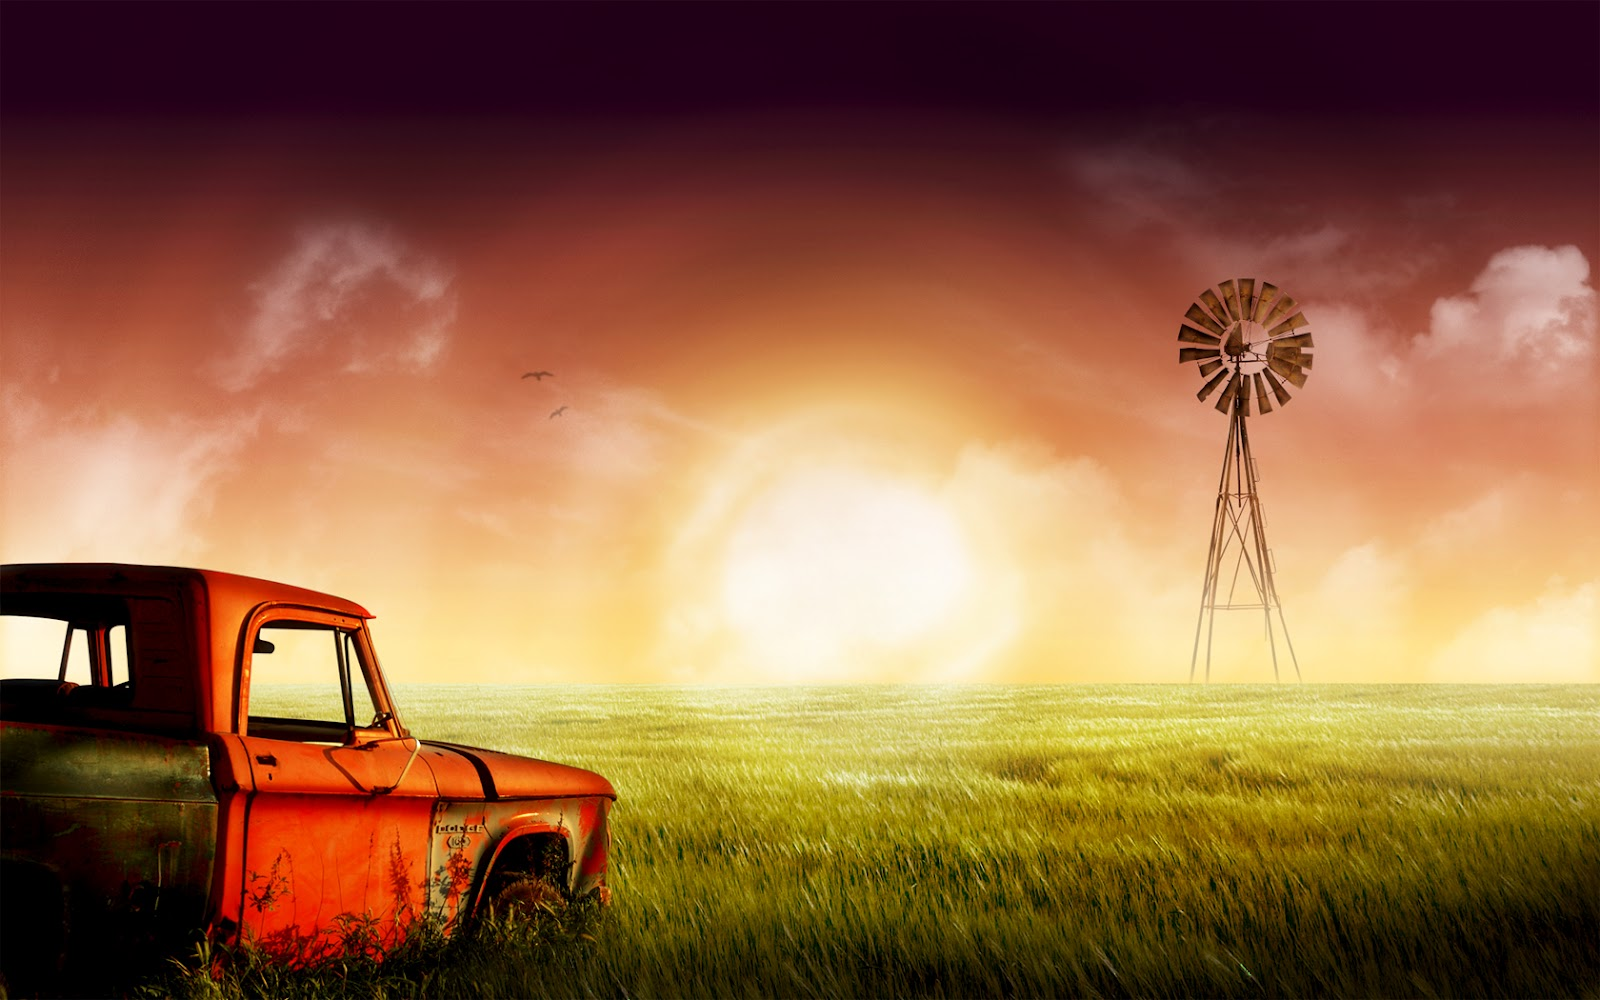 hd quality wallpaper,nature,sky,prairie,natural environment,plain